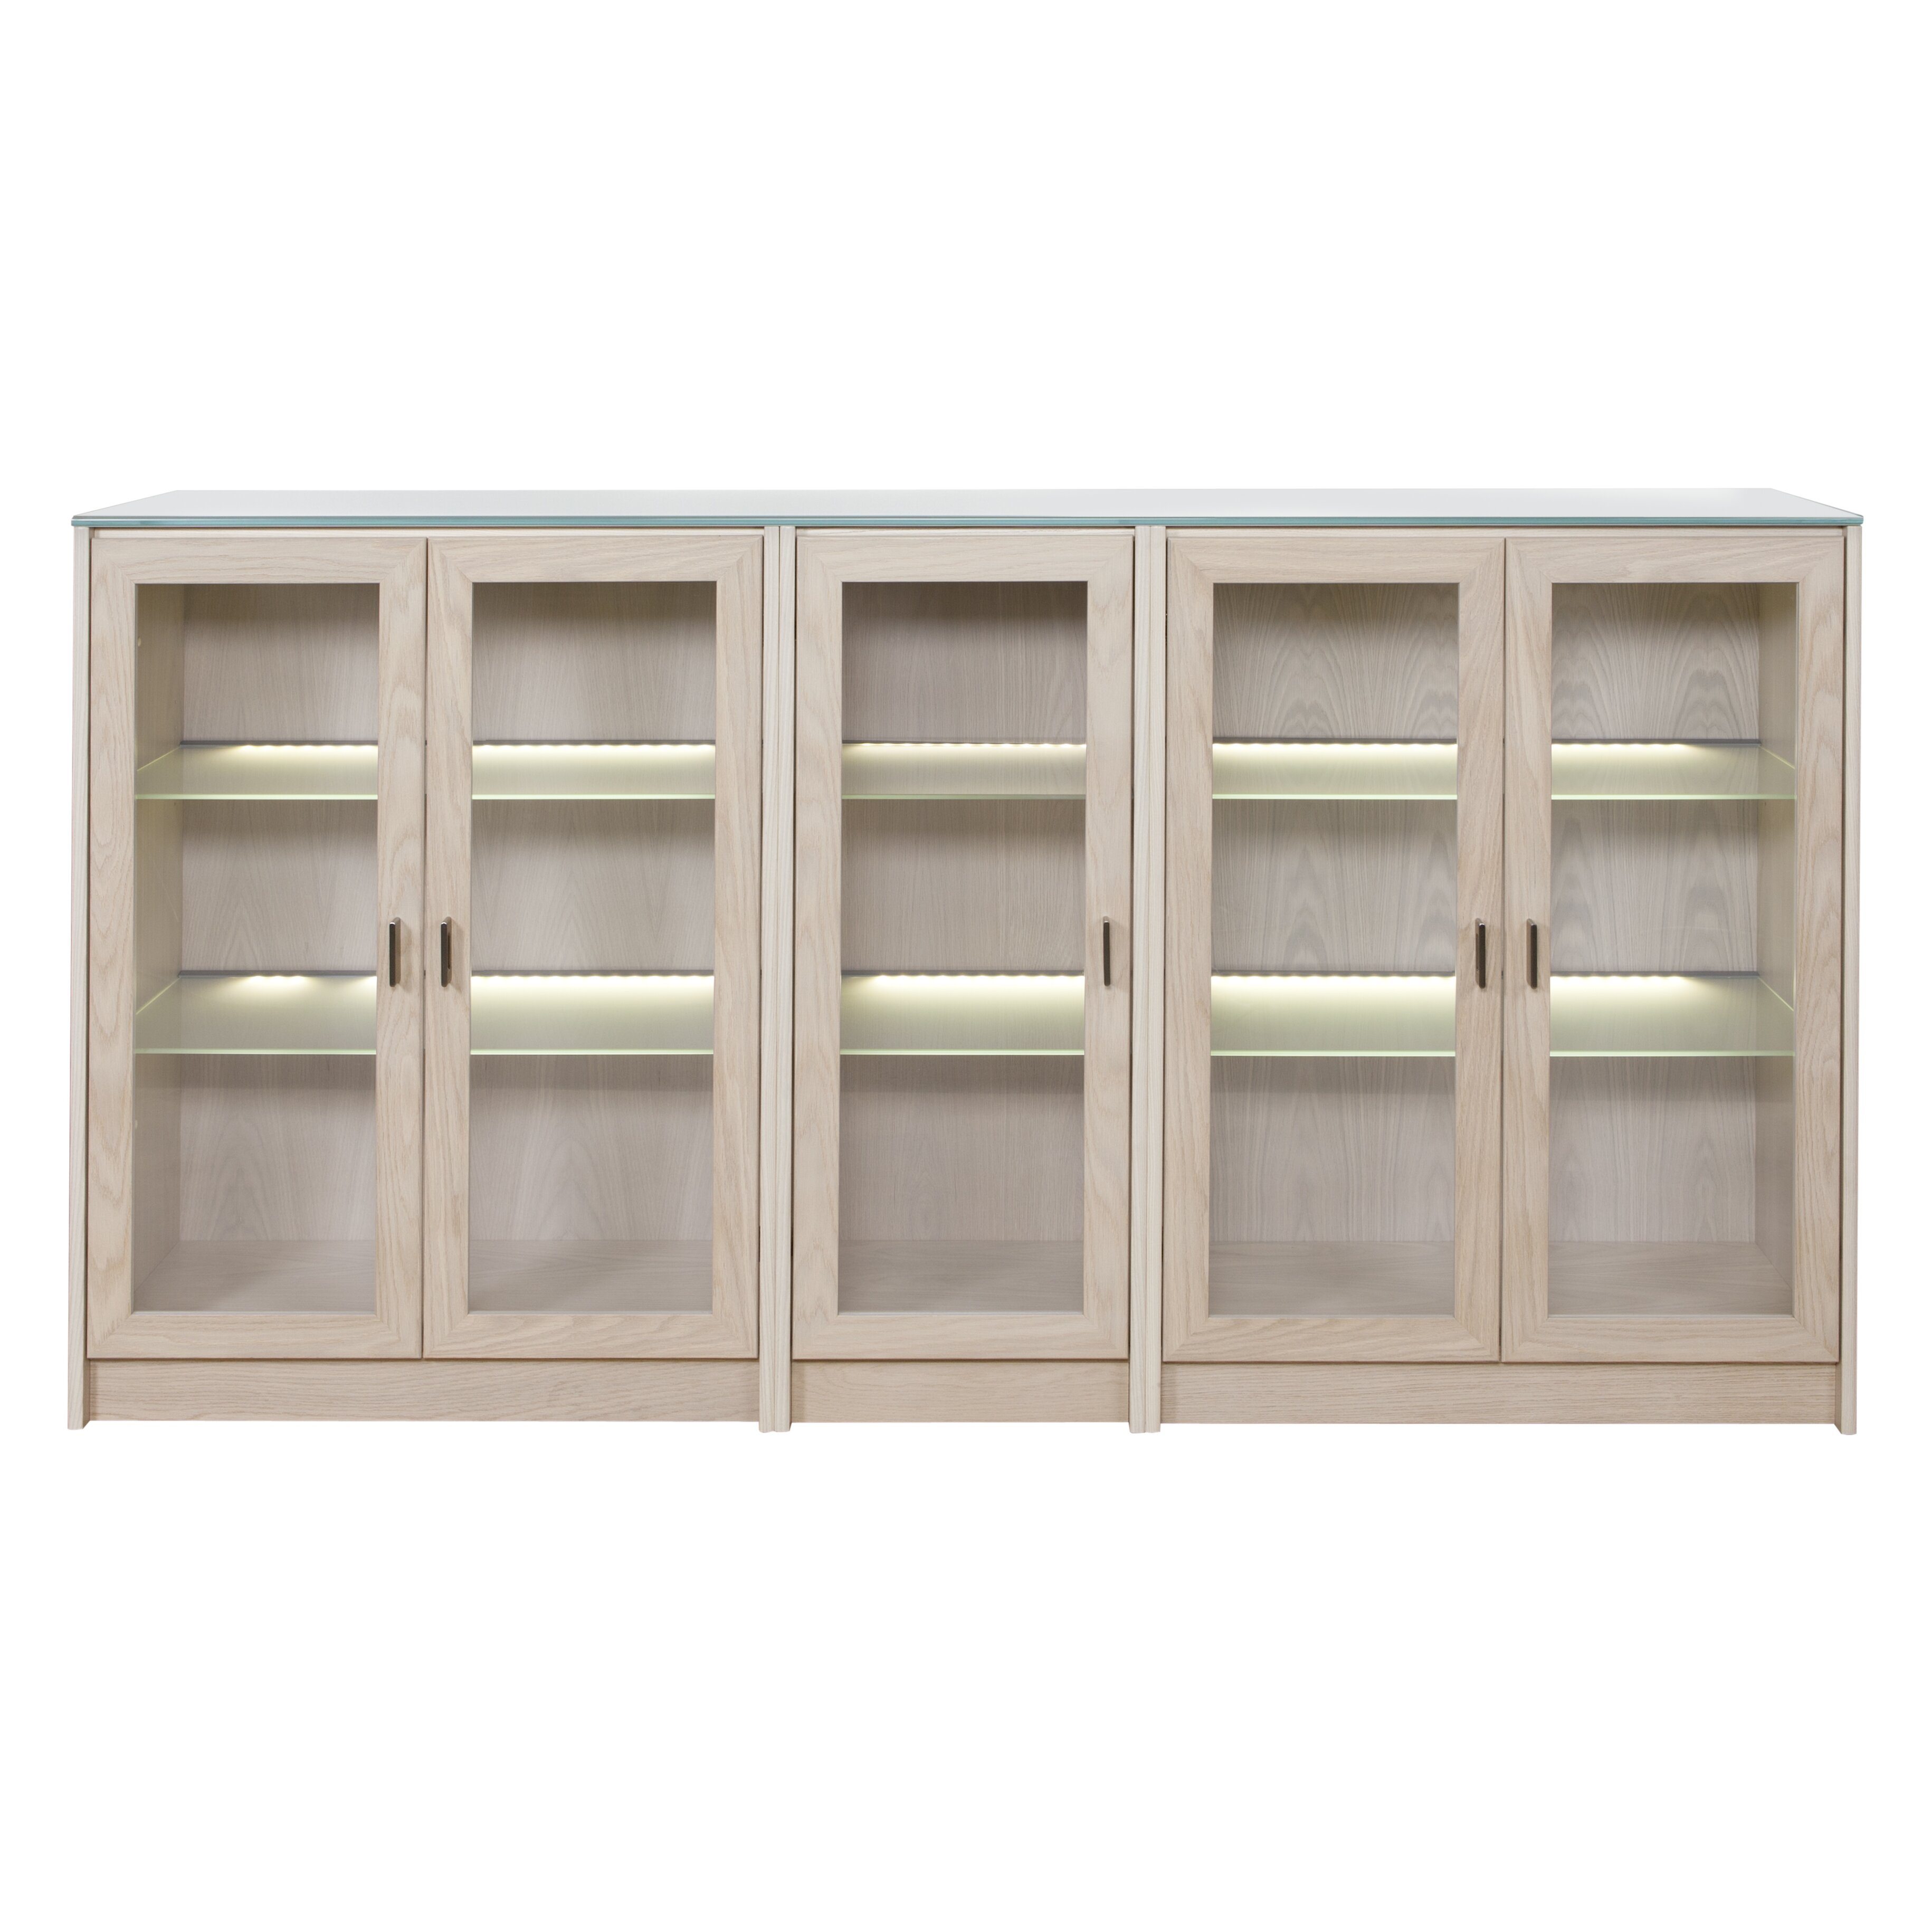 Dcor design regal 5 door sideboard for Sideboard regal